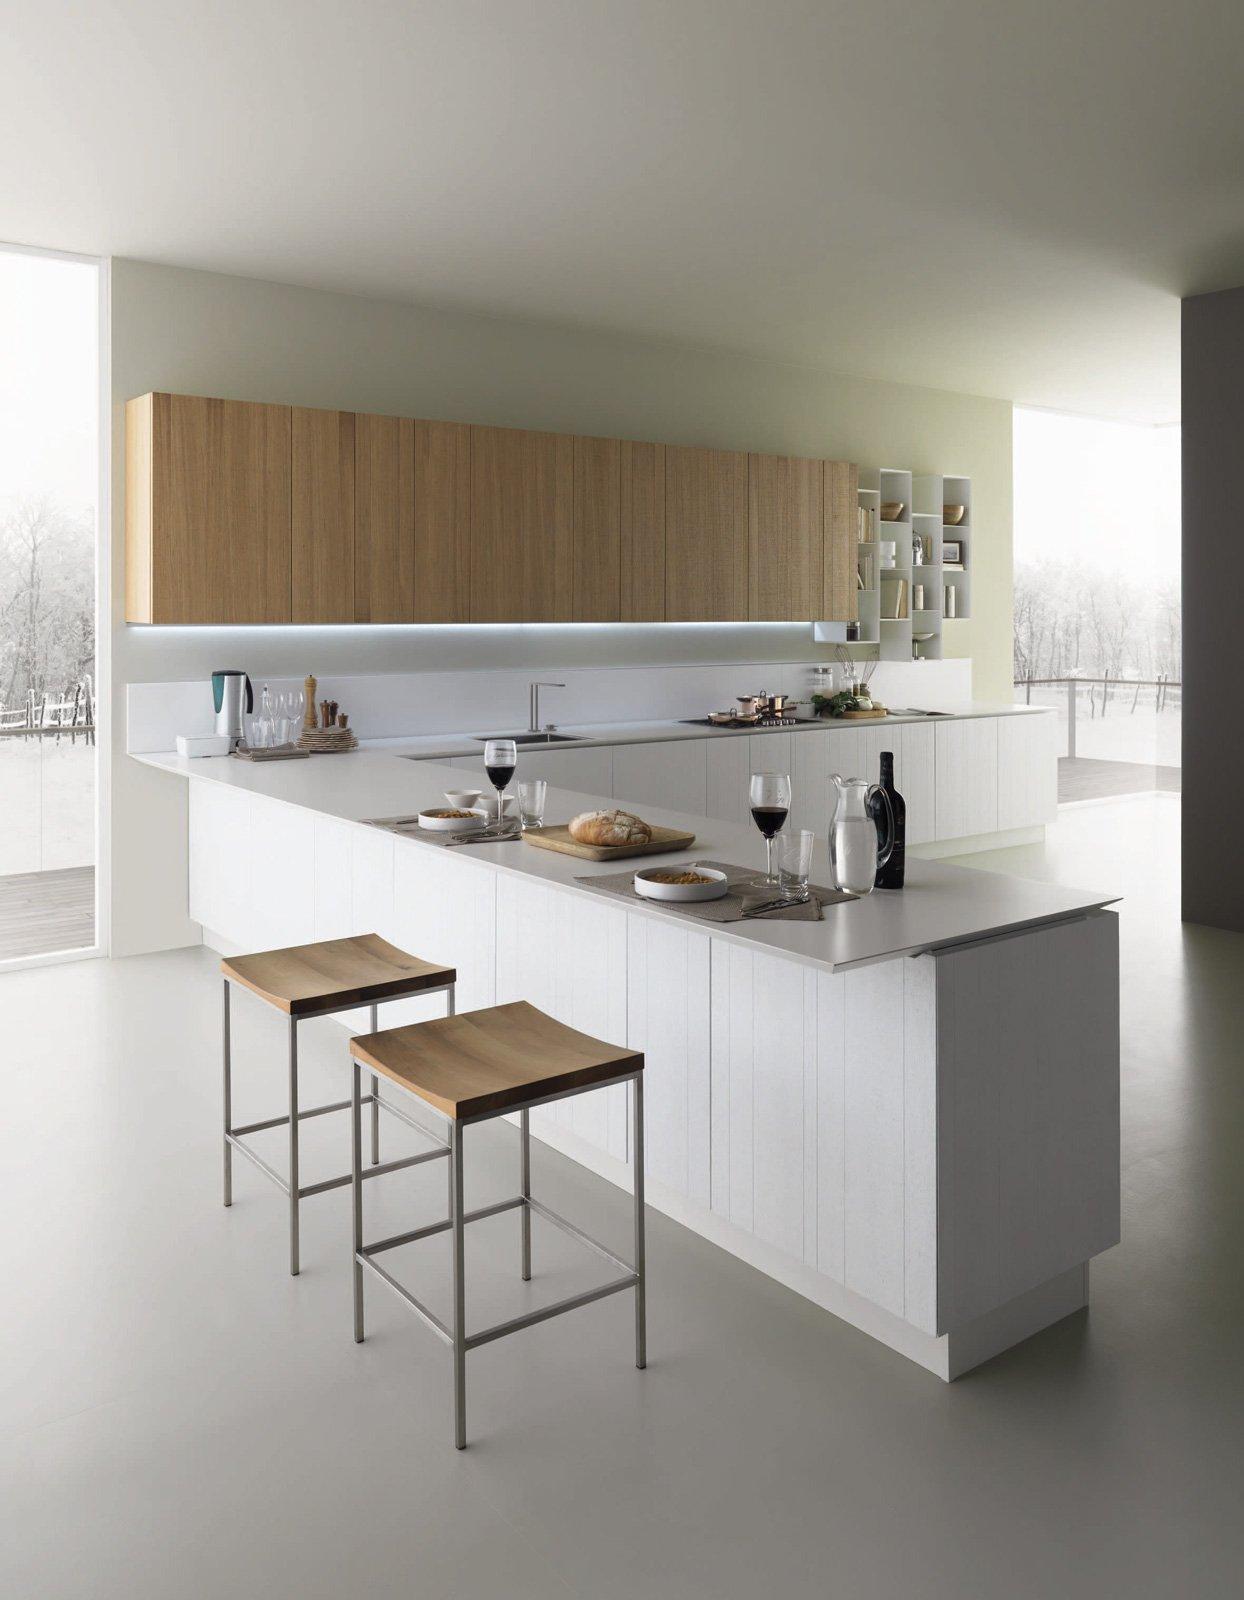 Cucine bianche lucide cucine with cucine bianche lucide - Cucine bianche lucide ...